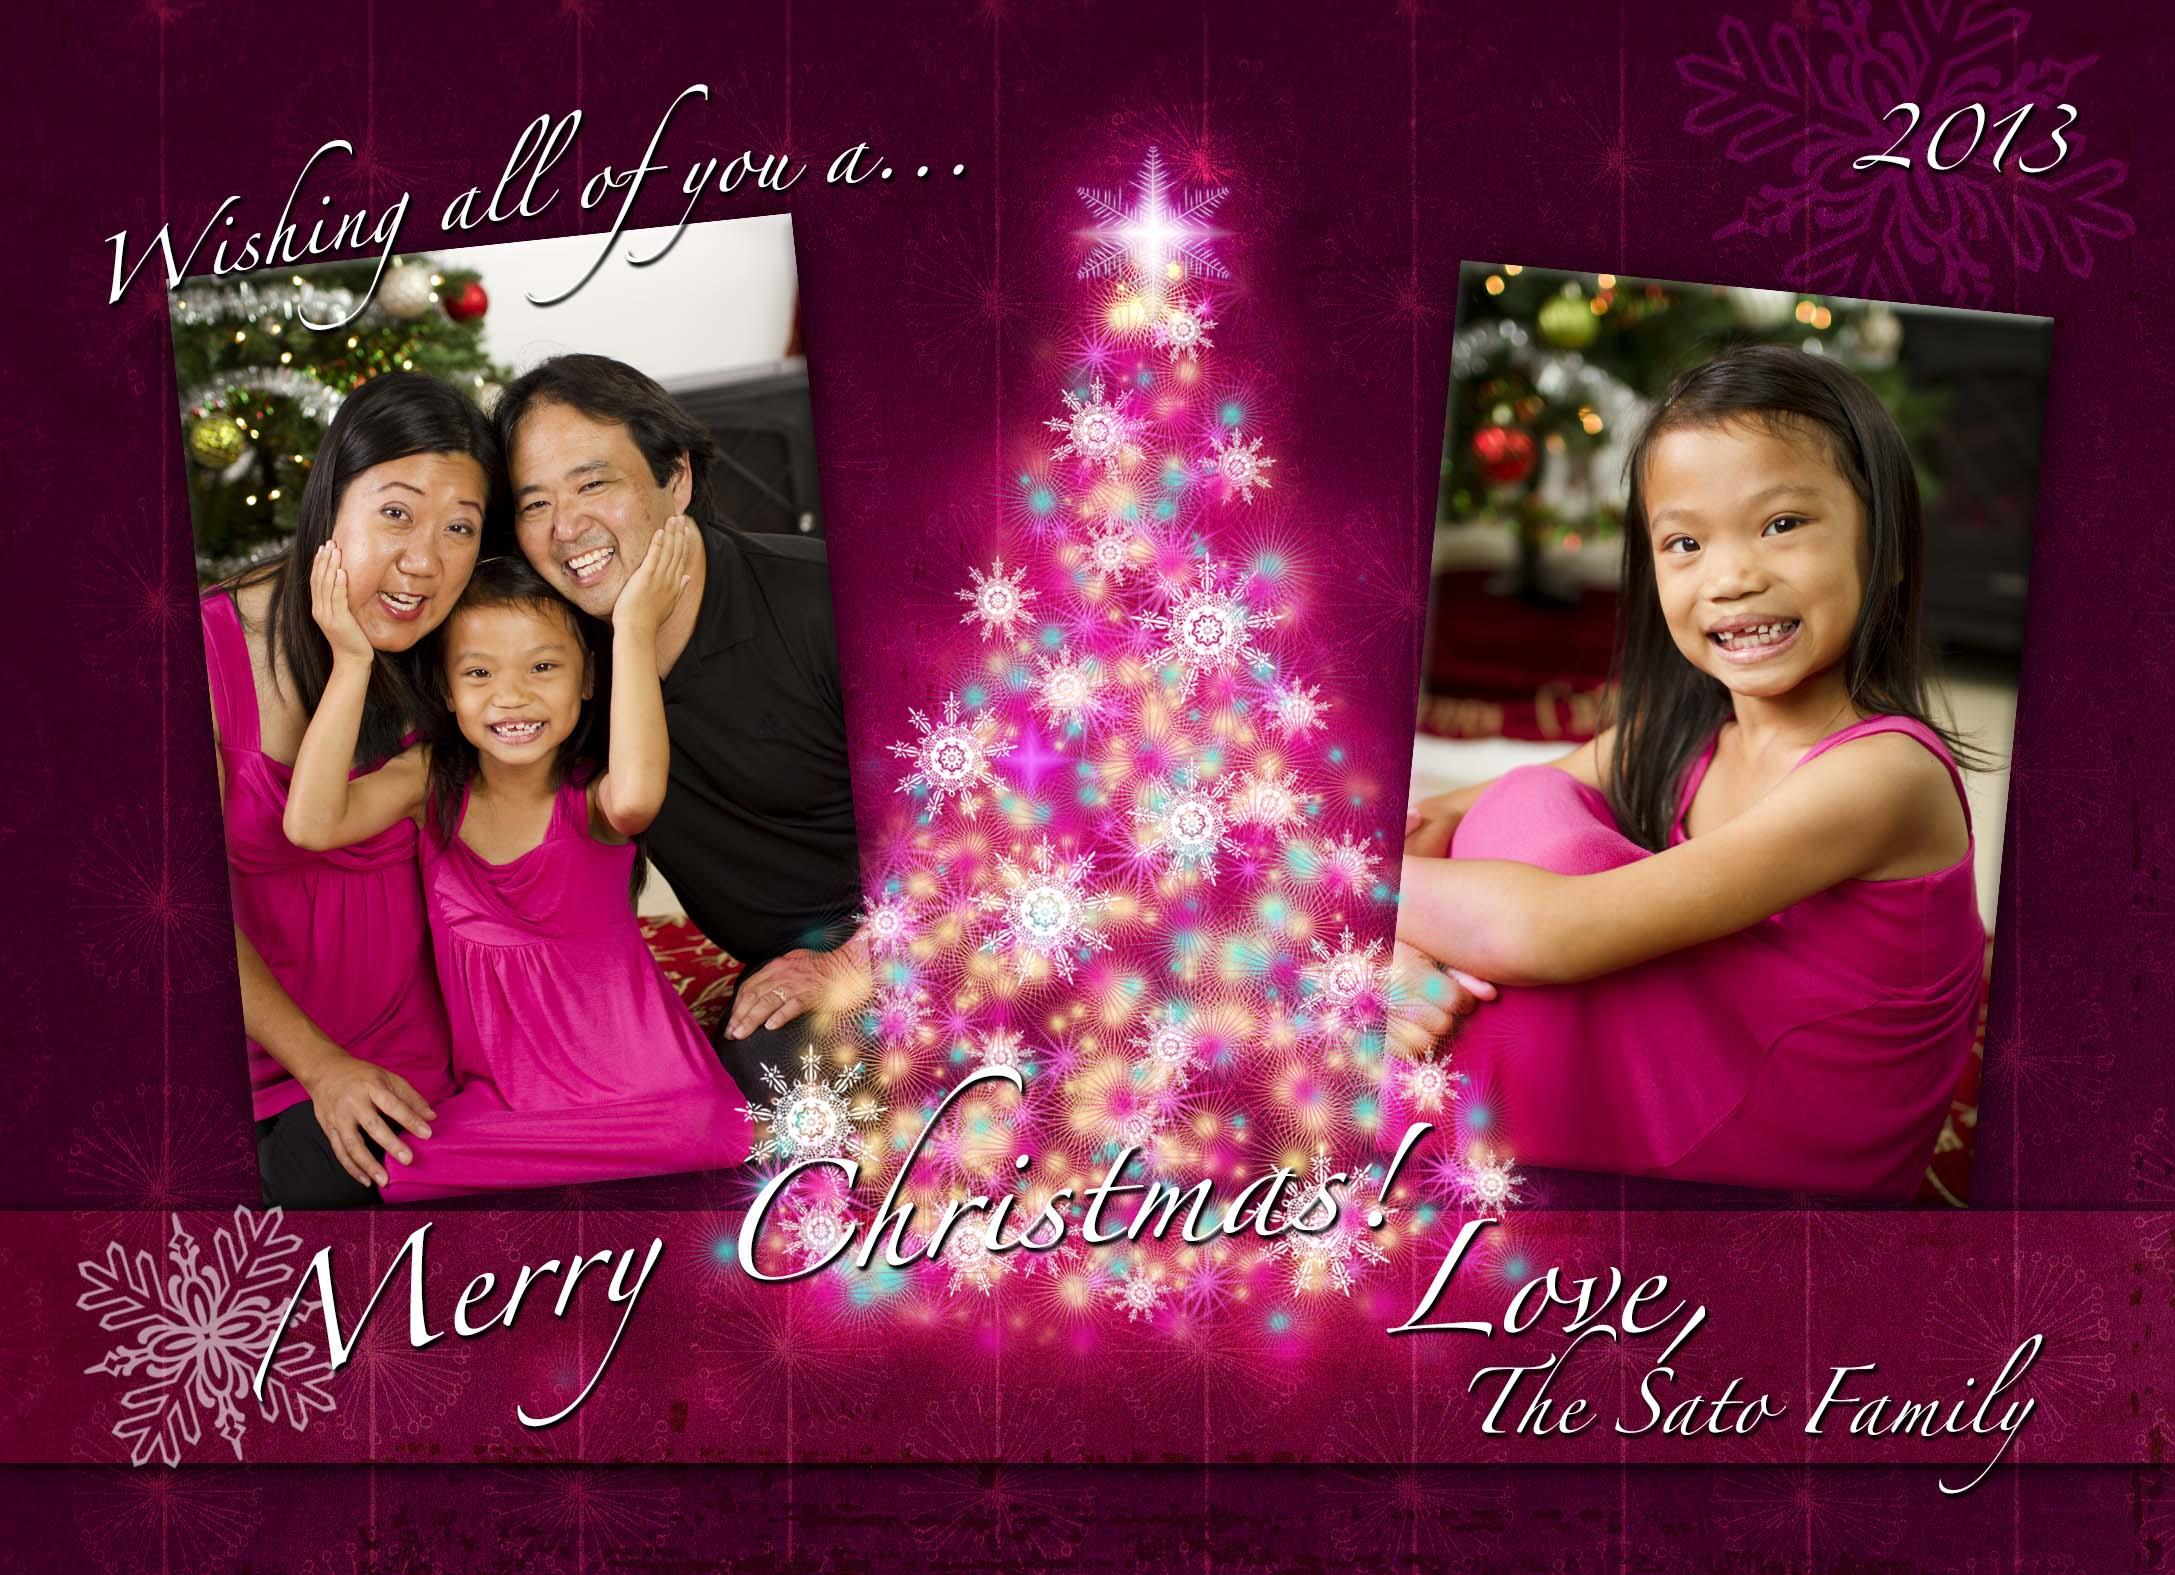 Christmas Card13 Front.jpg